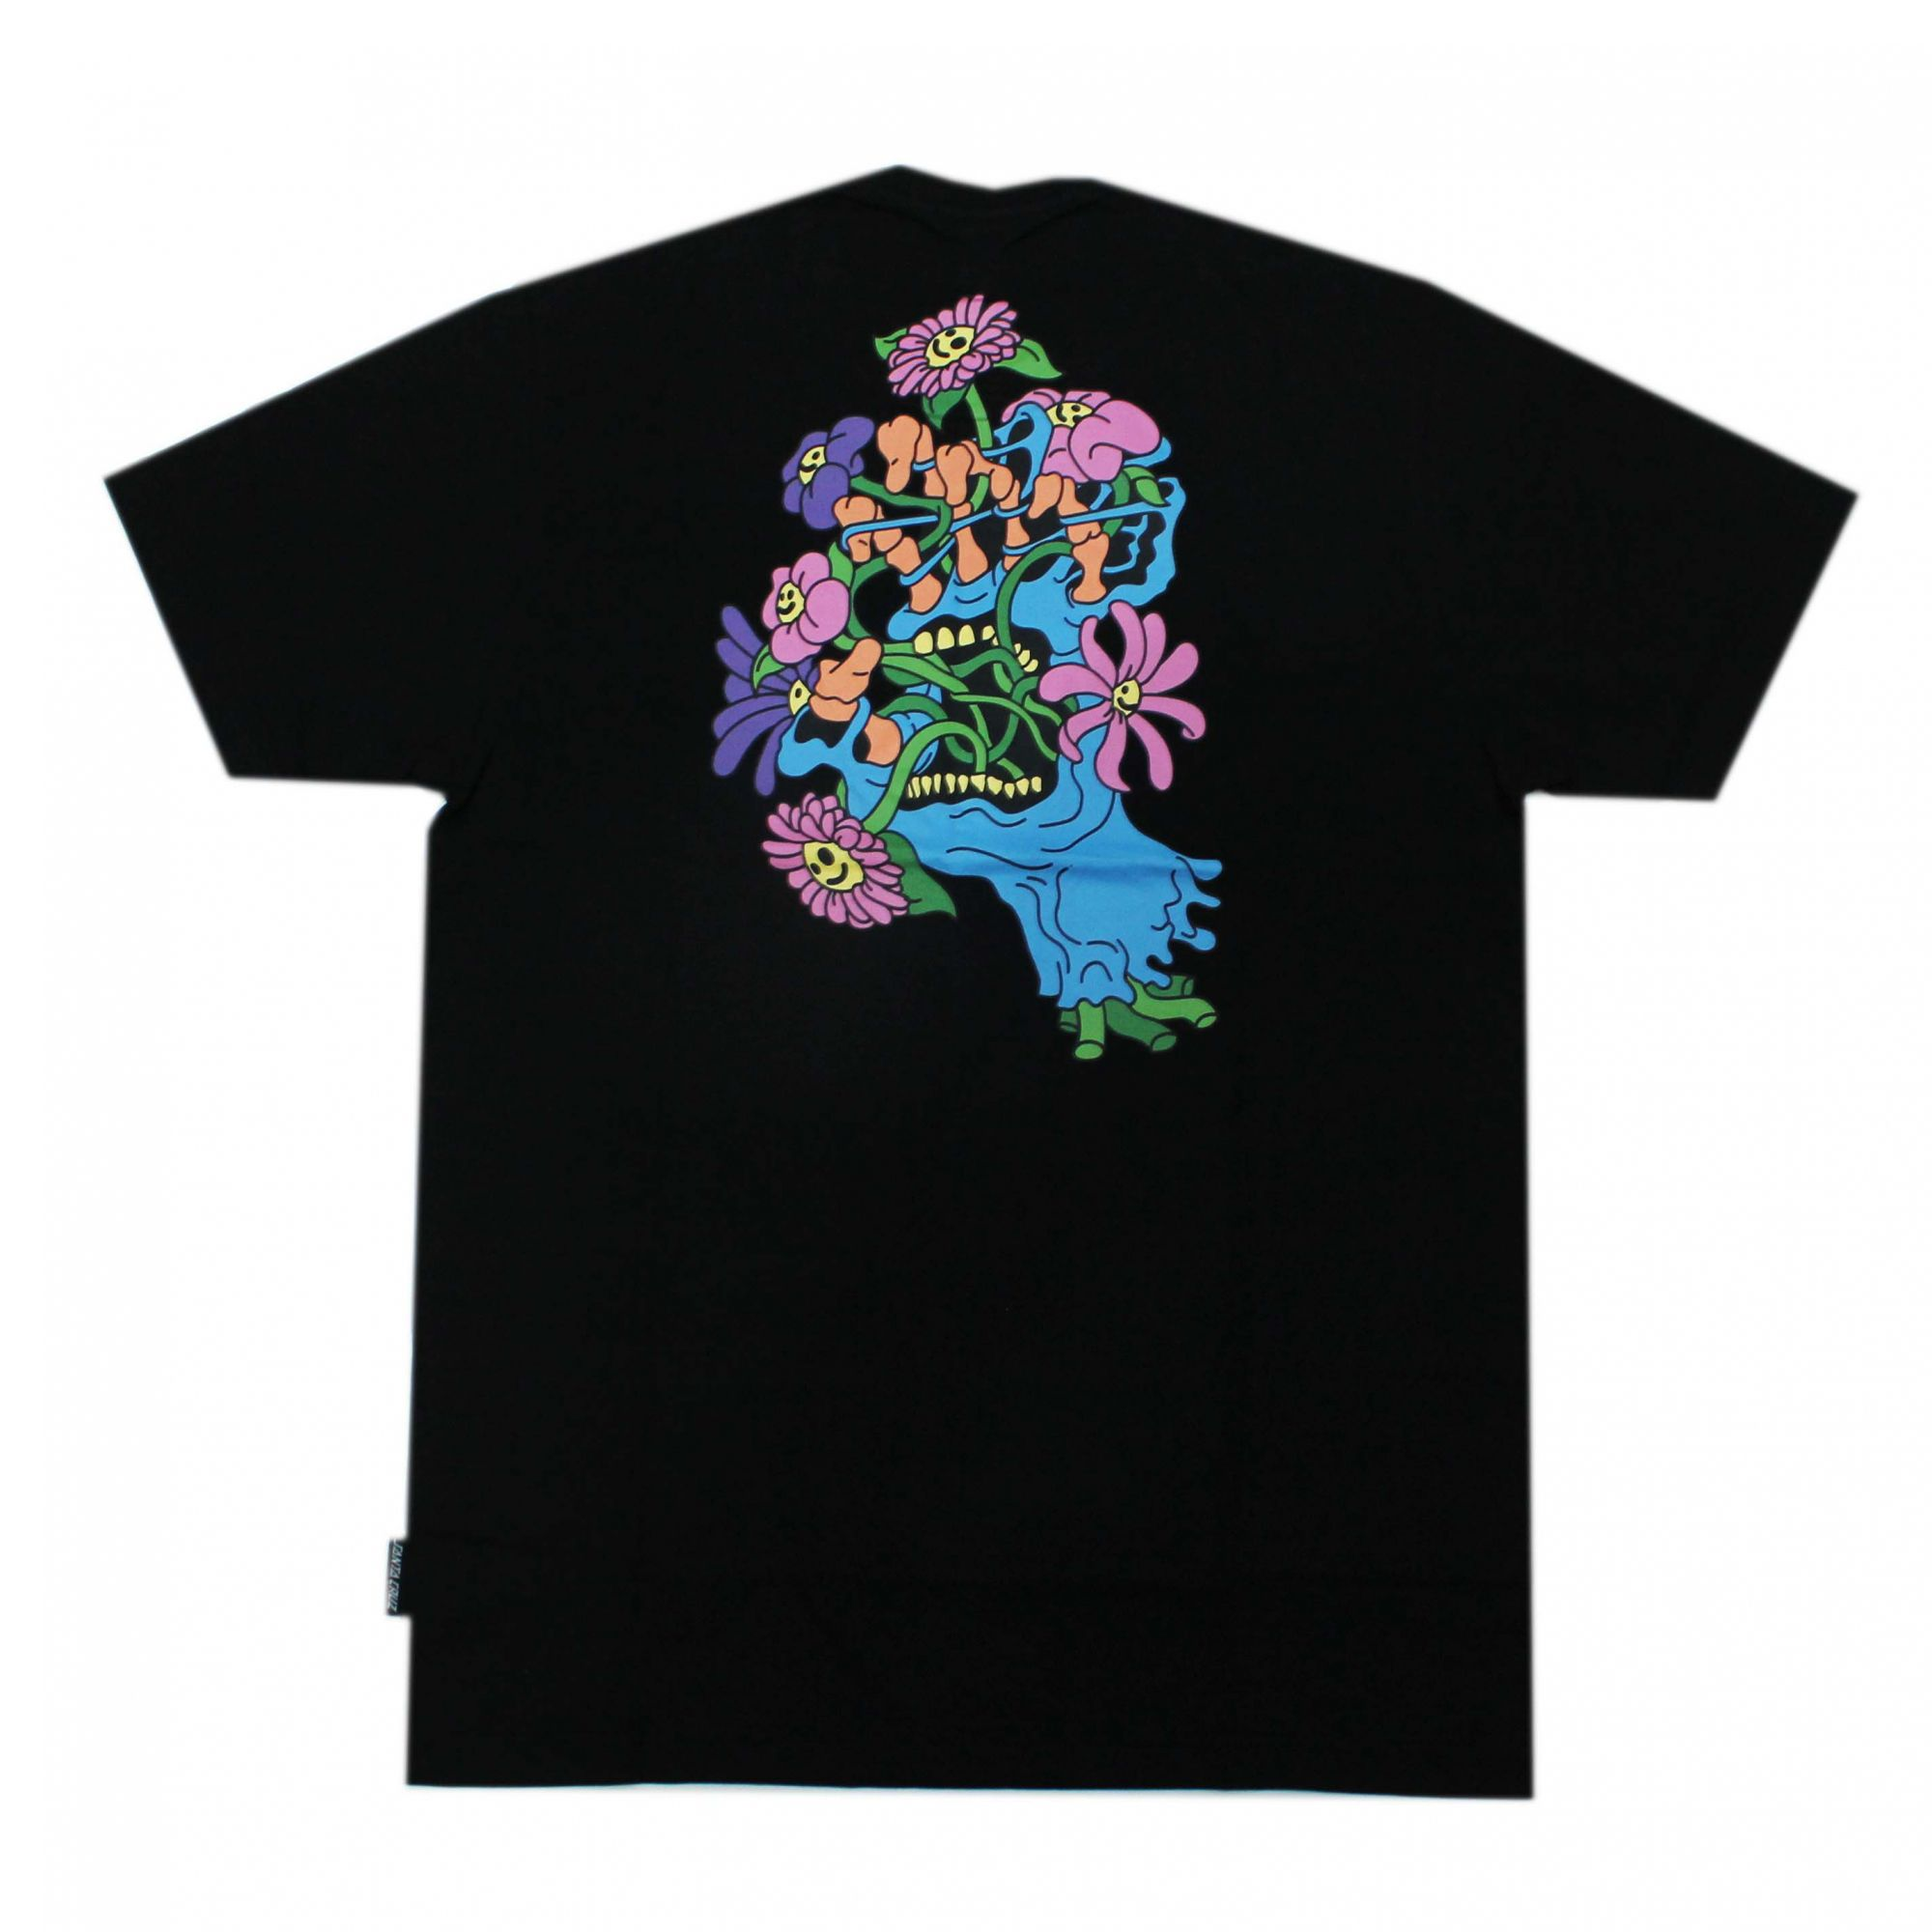 Camiseta Santa Cruz Baked Hand Preto